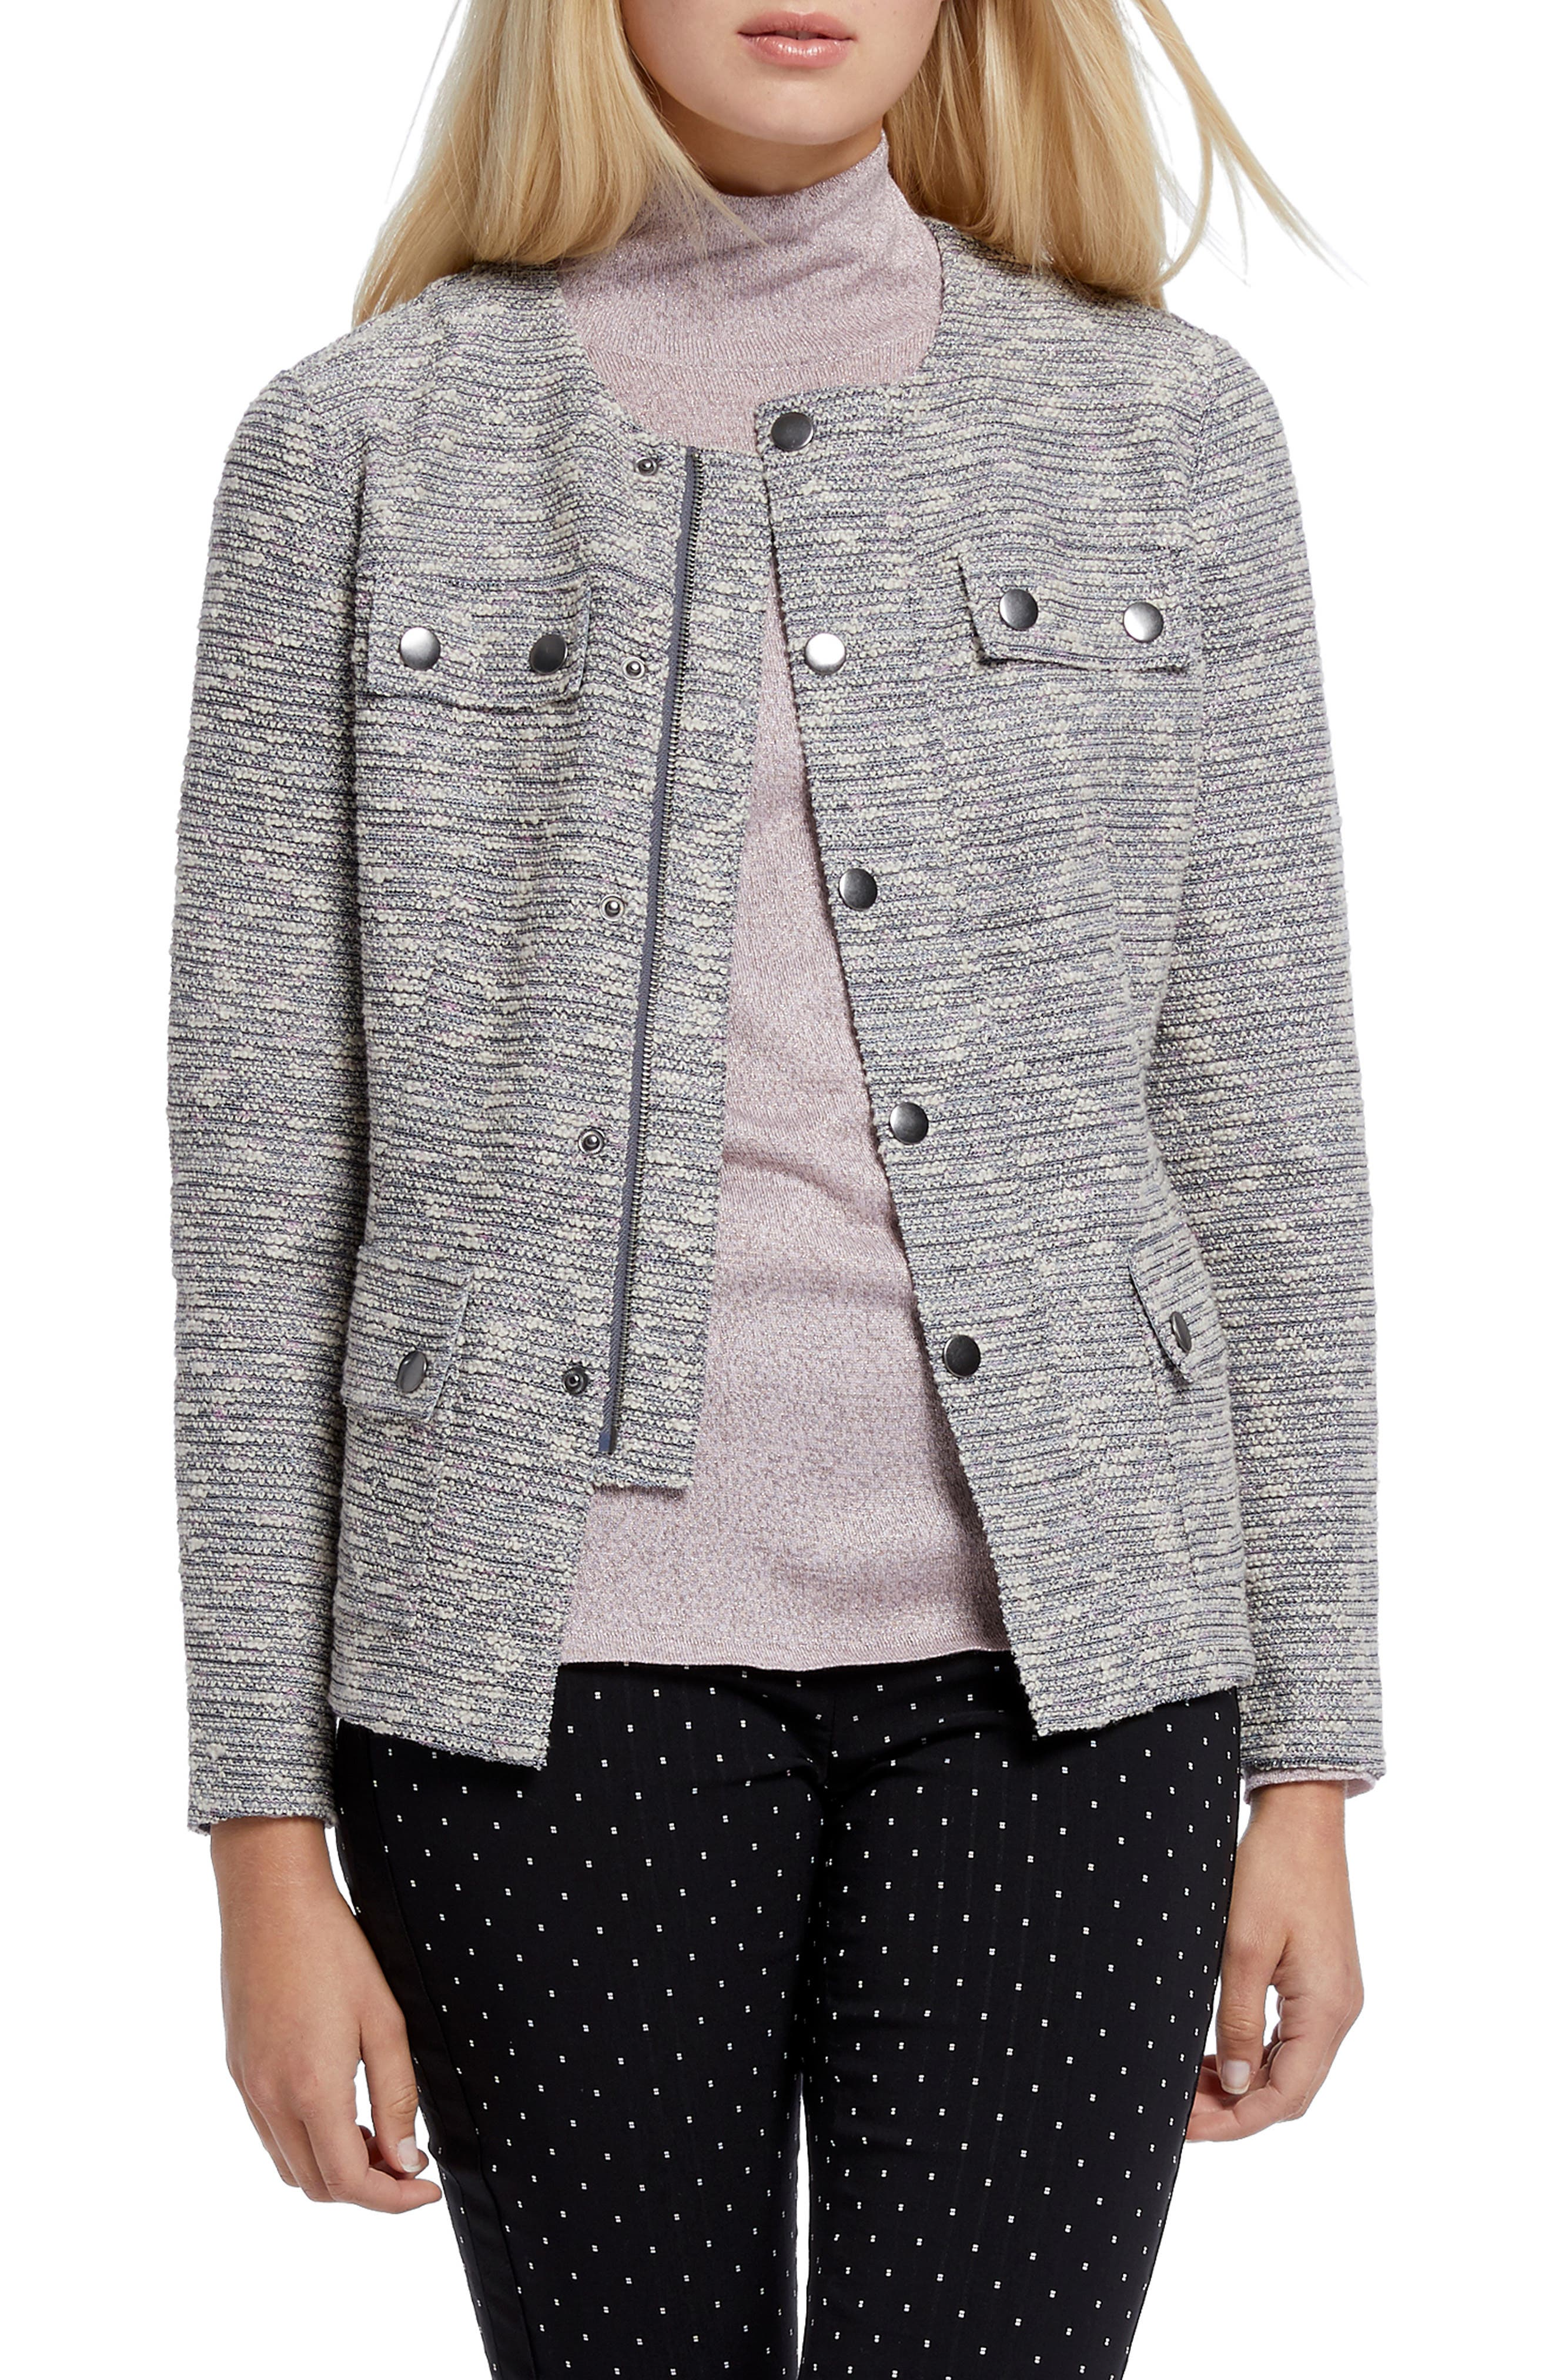 Nic+zoe Coats The Ritz Metallic Thread Cotton Blend Jacket